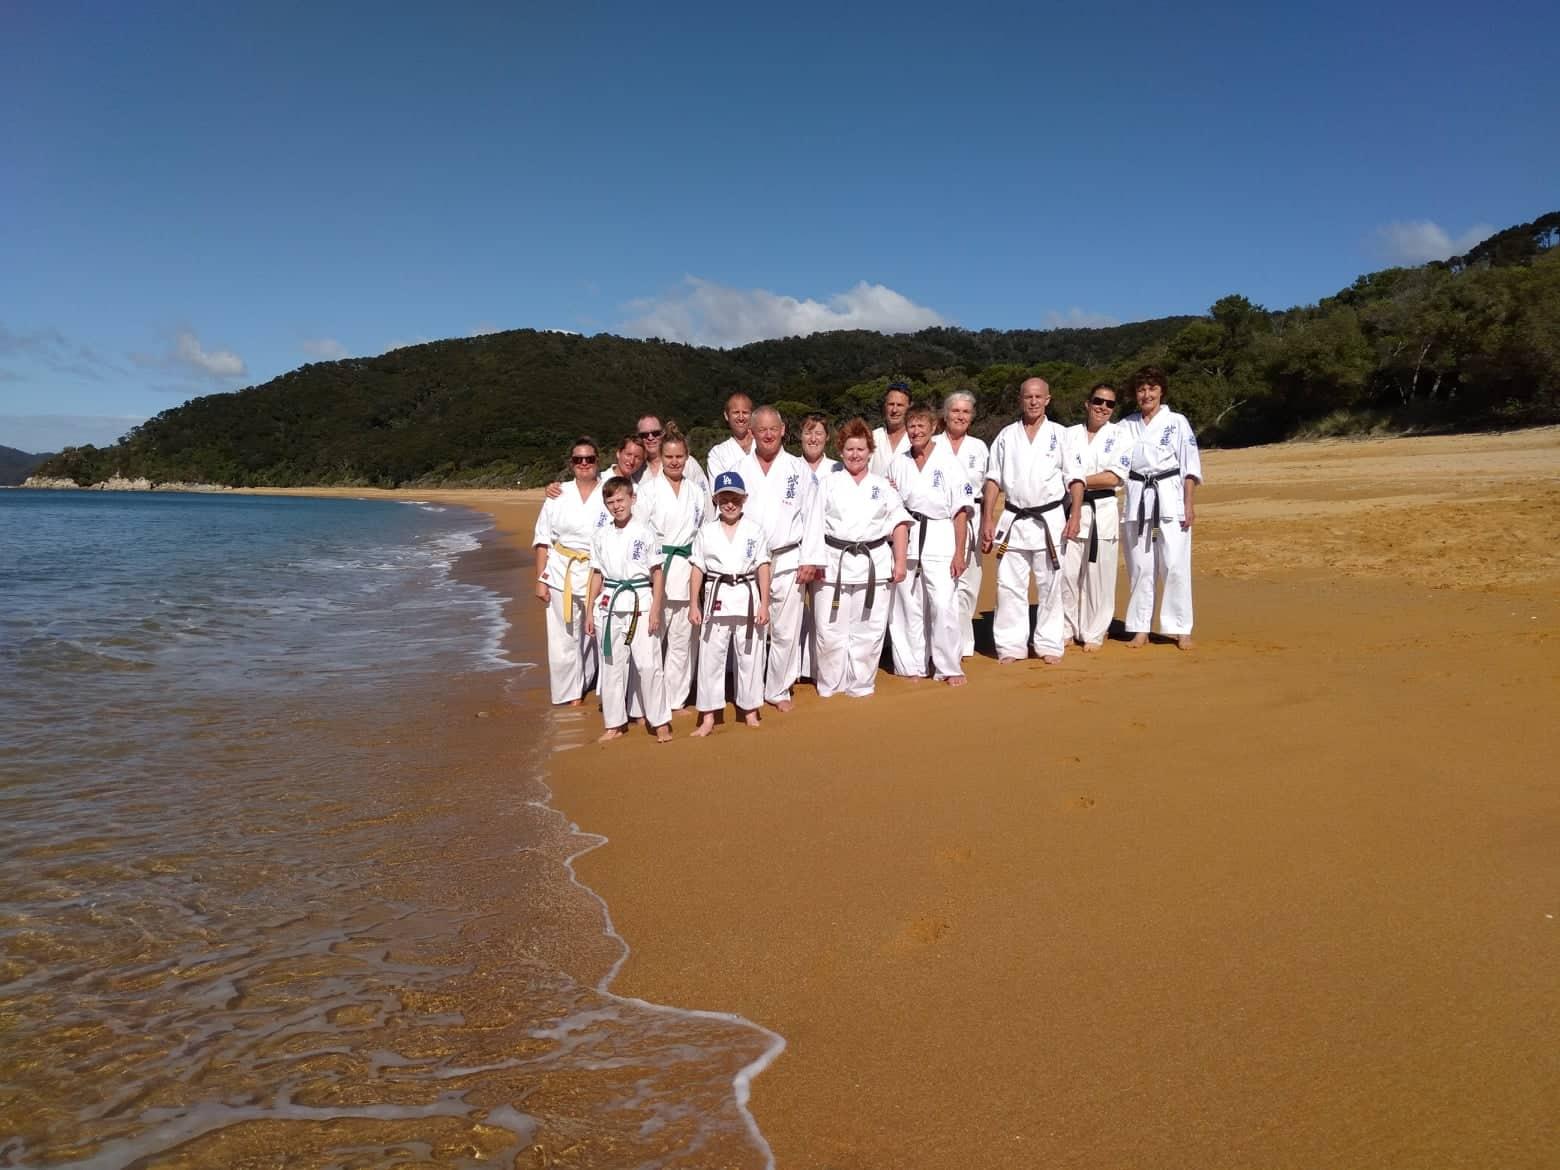 Motueka Seido Karate Club